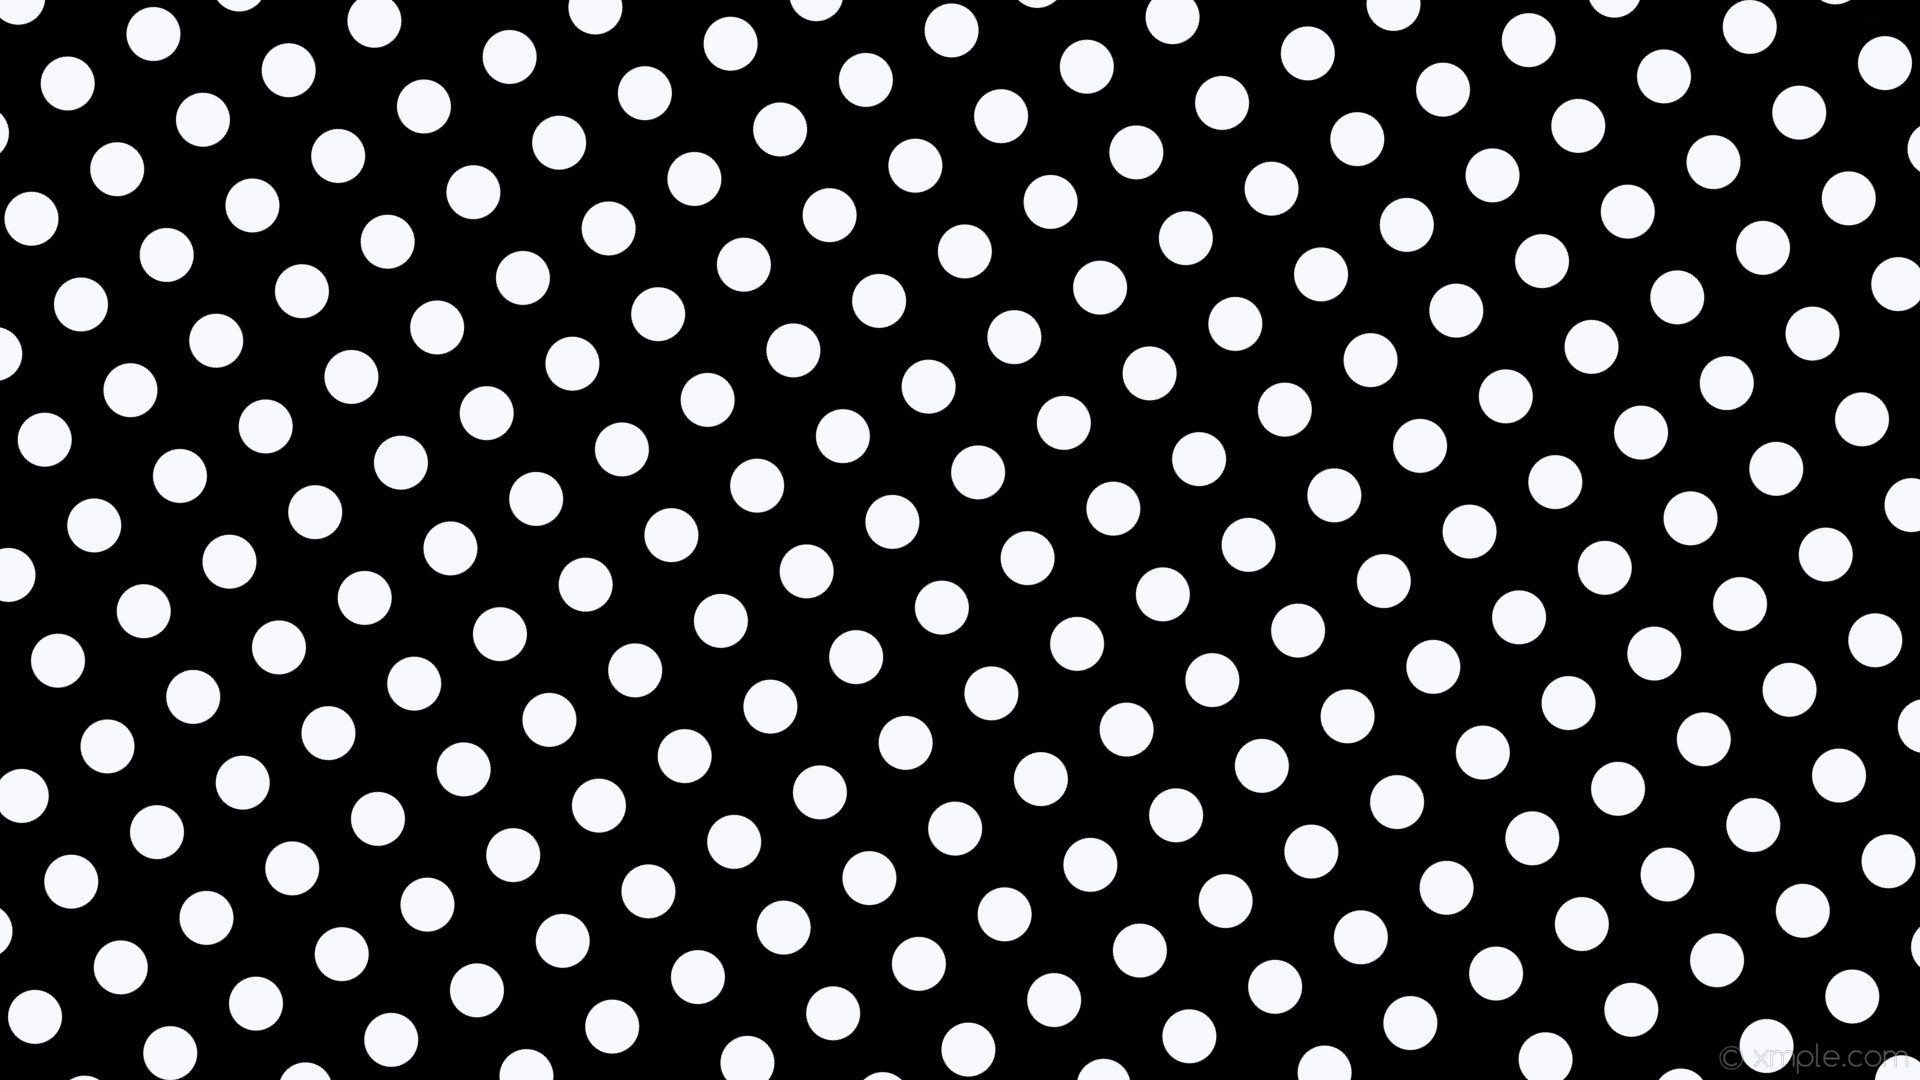 wallpaper spots black dots white polka ghost white #000000 #f8f8ff 210°  54px 99px